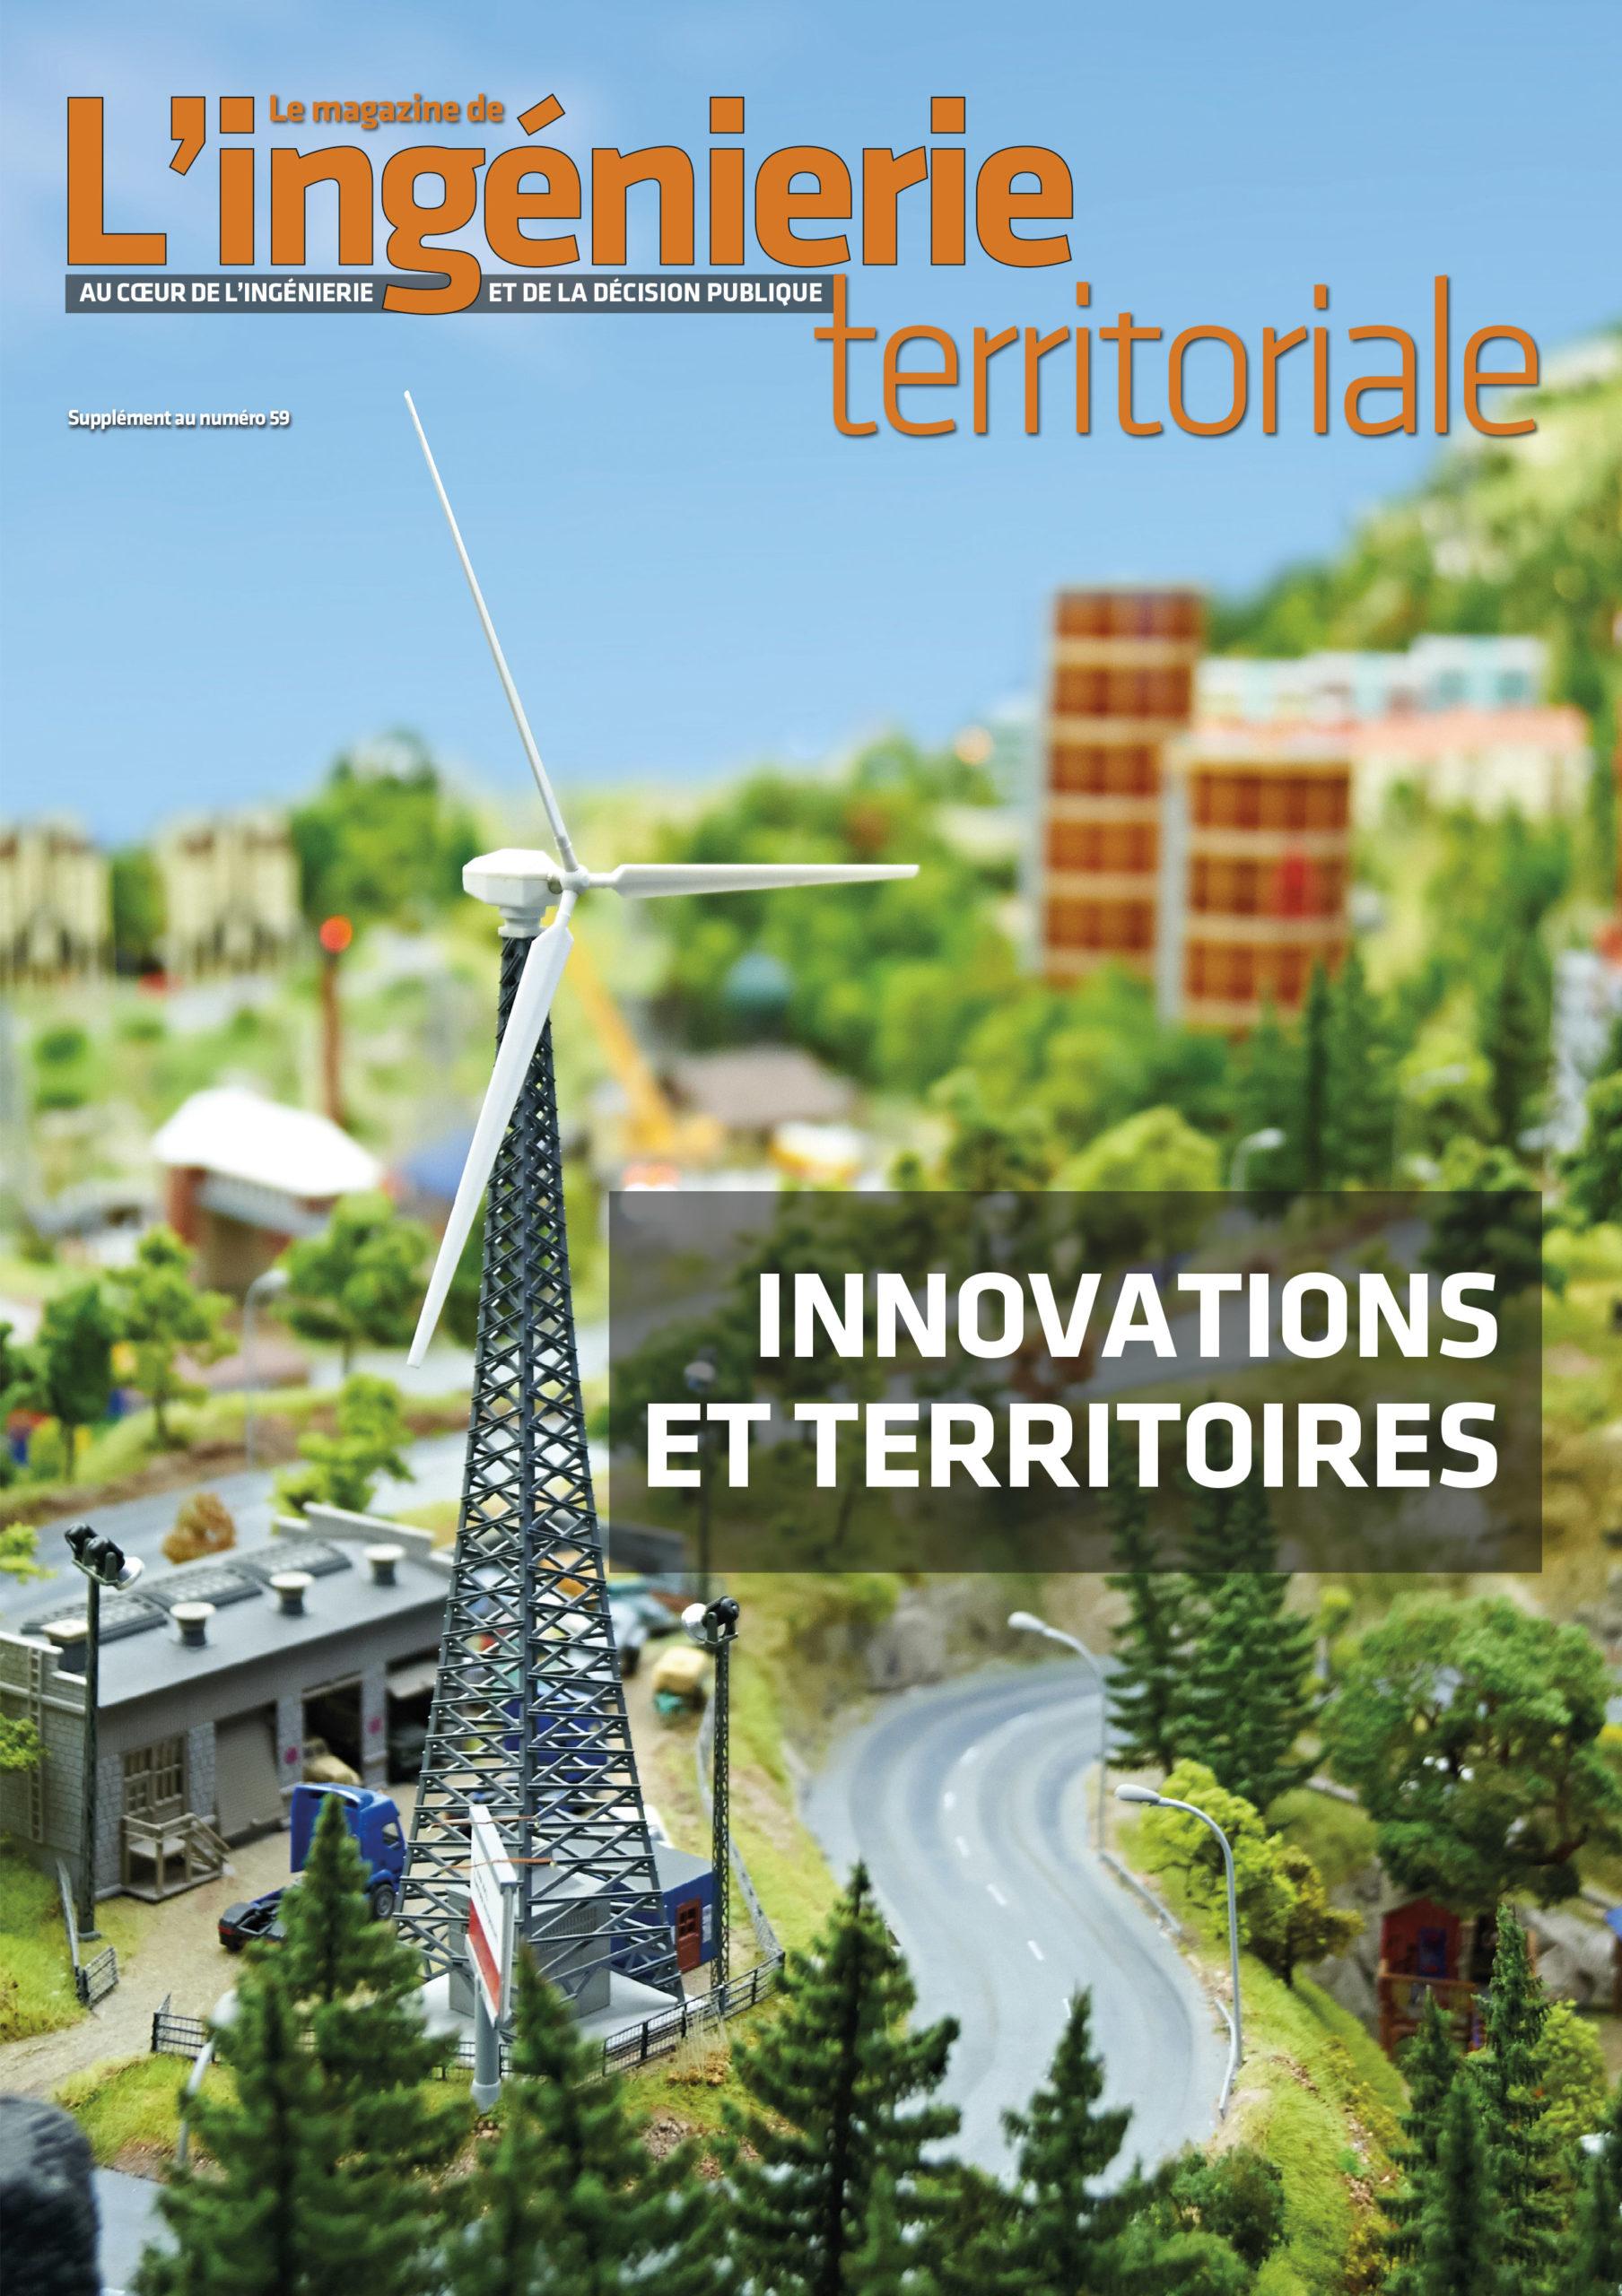 Ingénierie territoriale – Hors-série du n°59 – Innovations et territoires